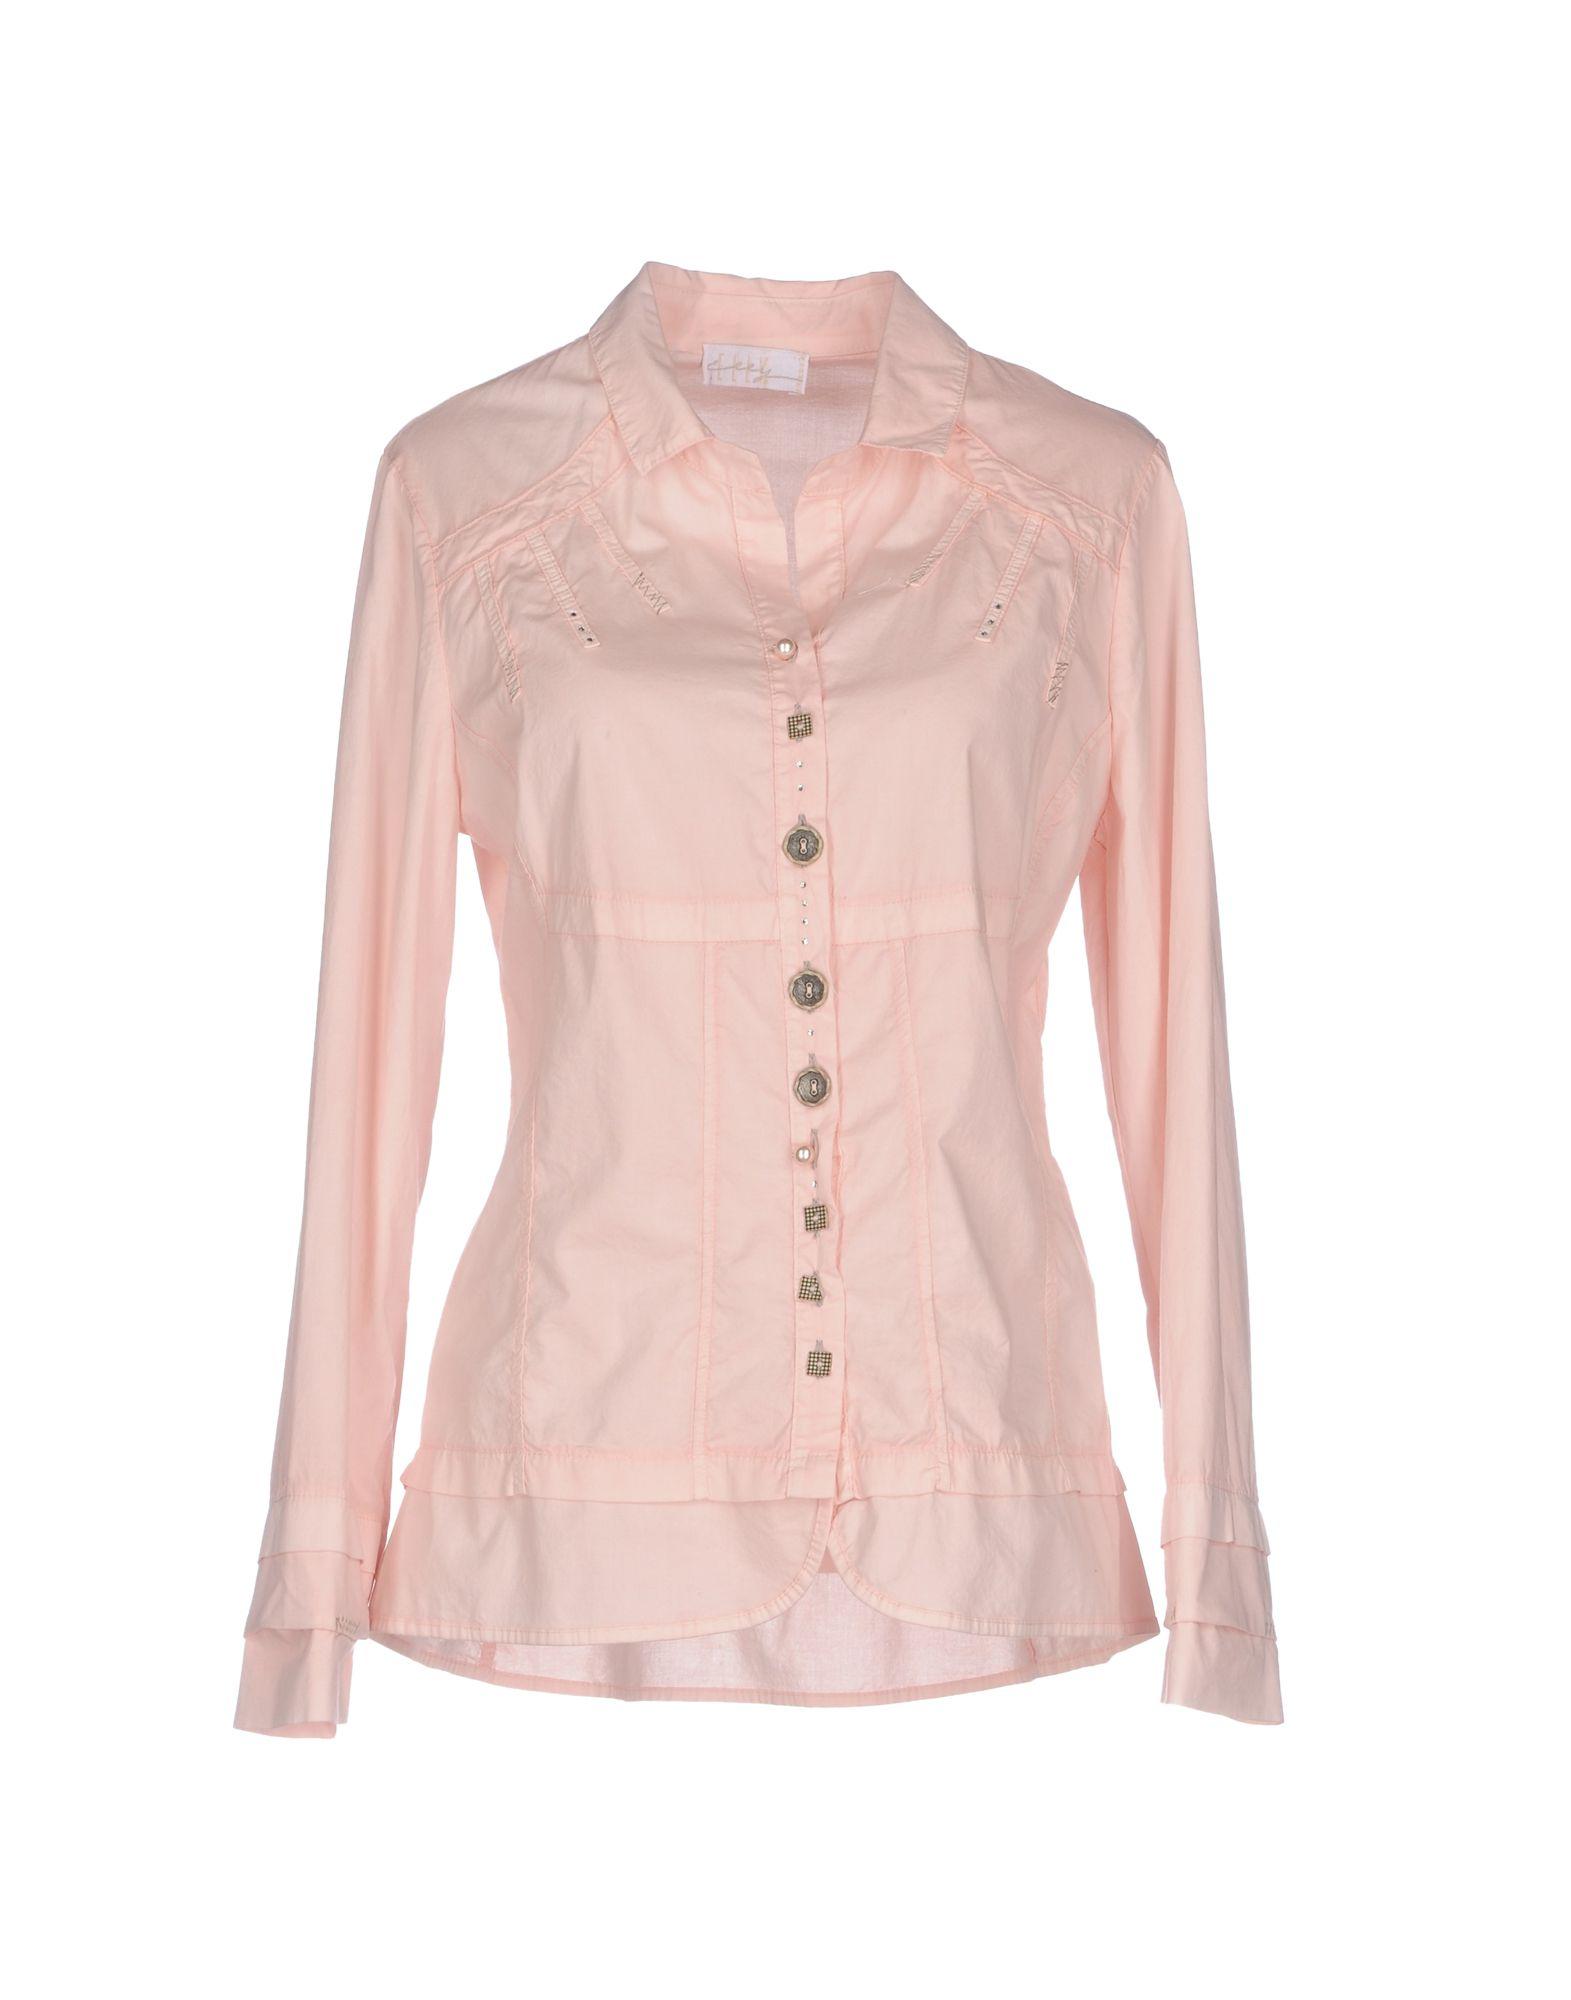 ELLY Damen Hemd Farbe Altrosa Größe 7